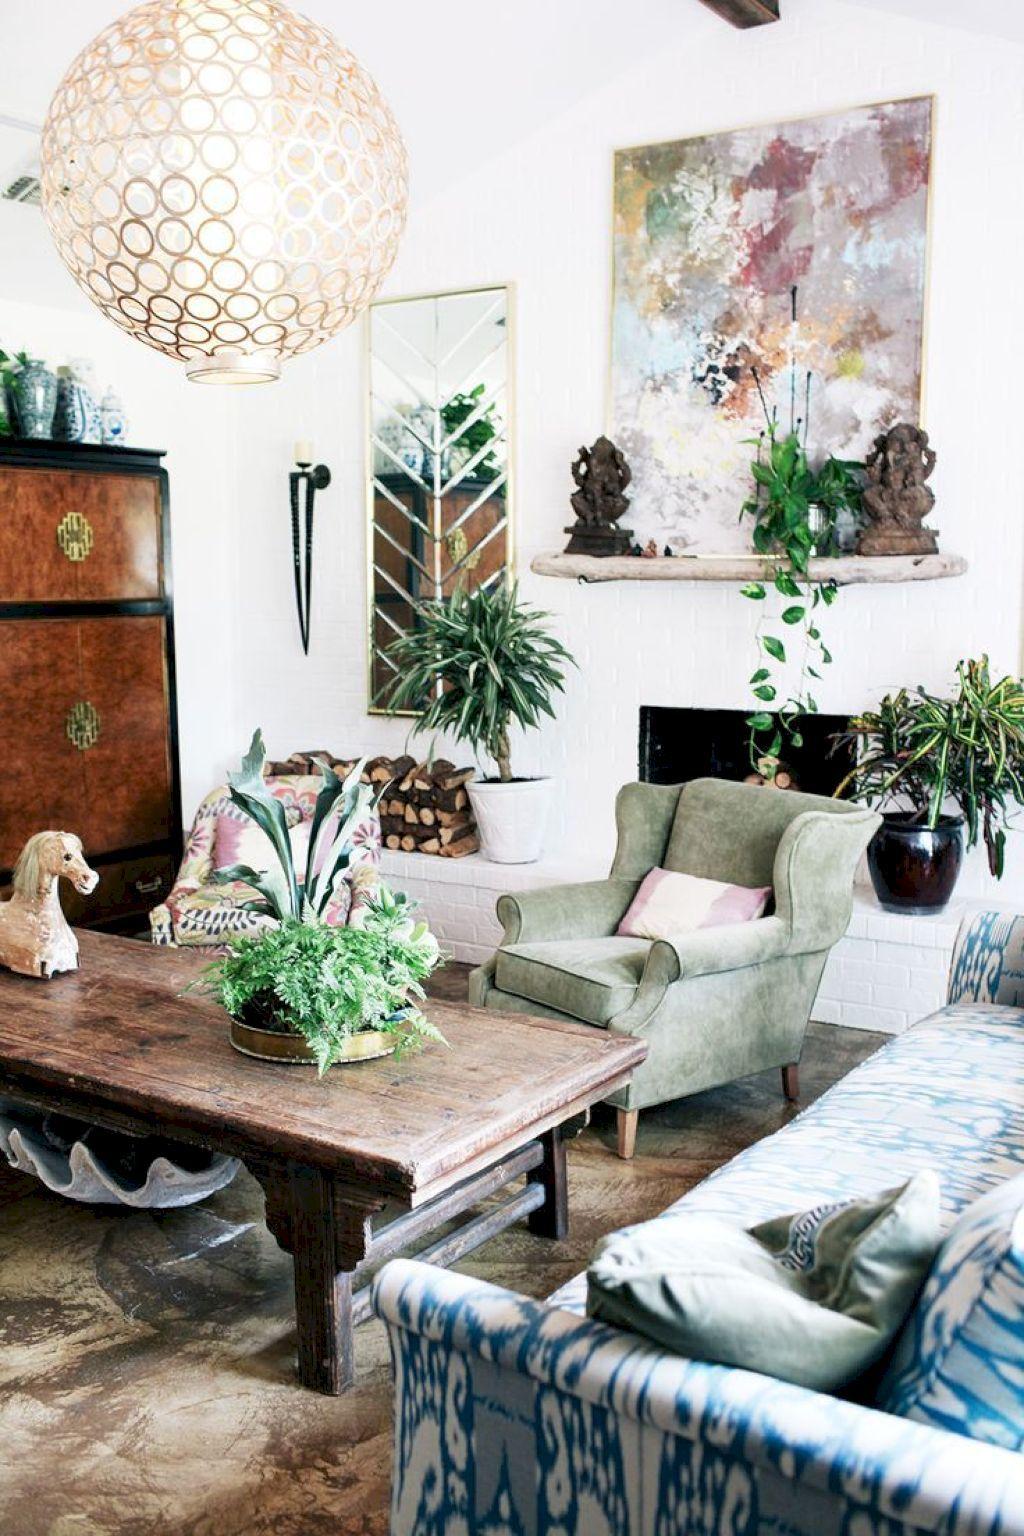 55 Fancy Bohemian Style Living Room Decor Ideas | Room decor, Living ...